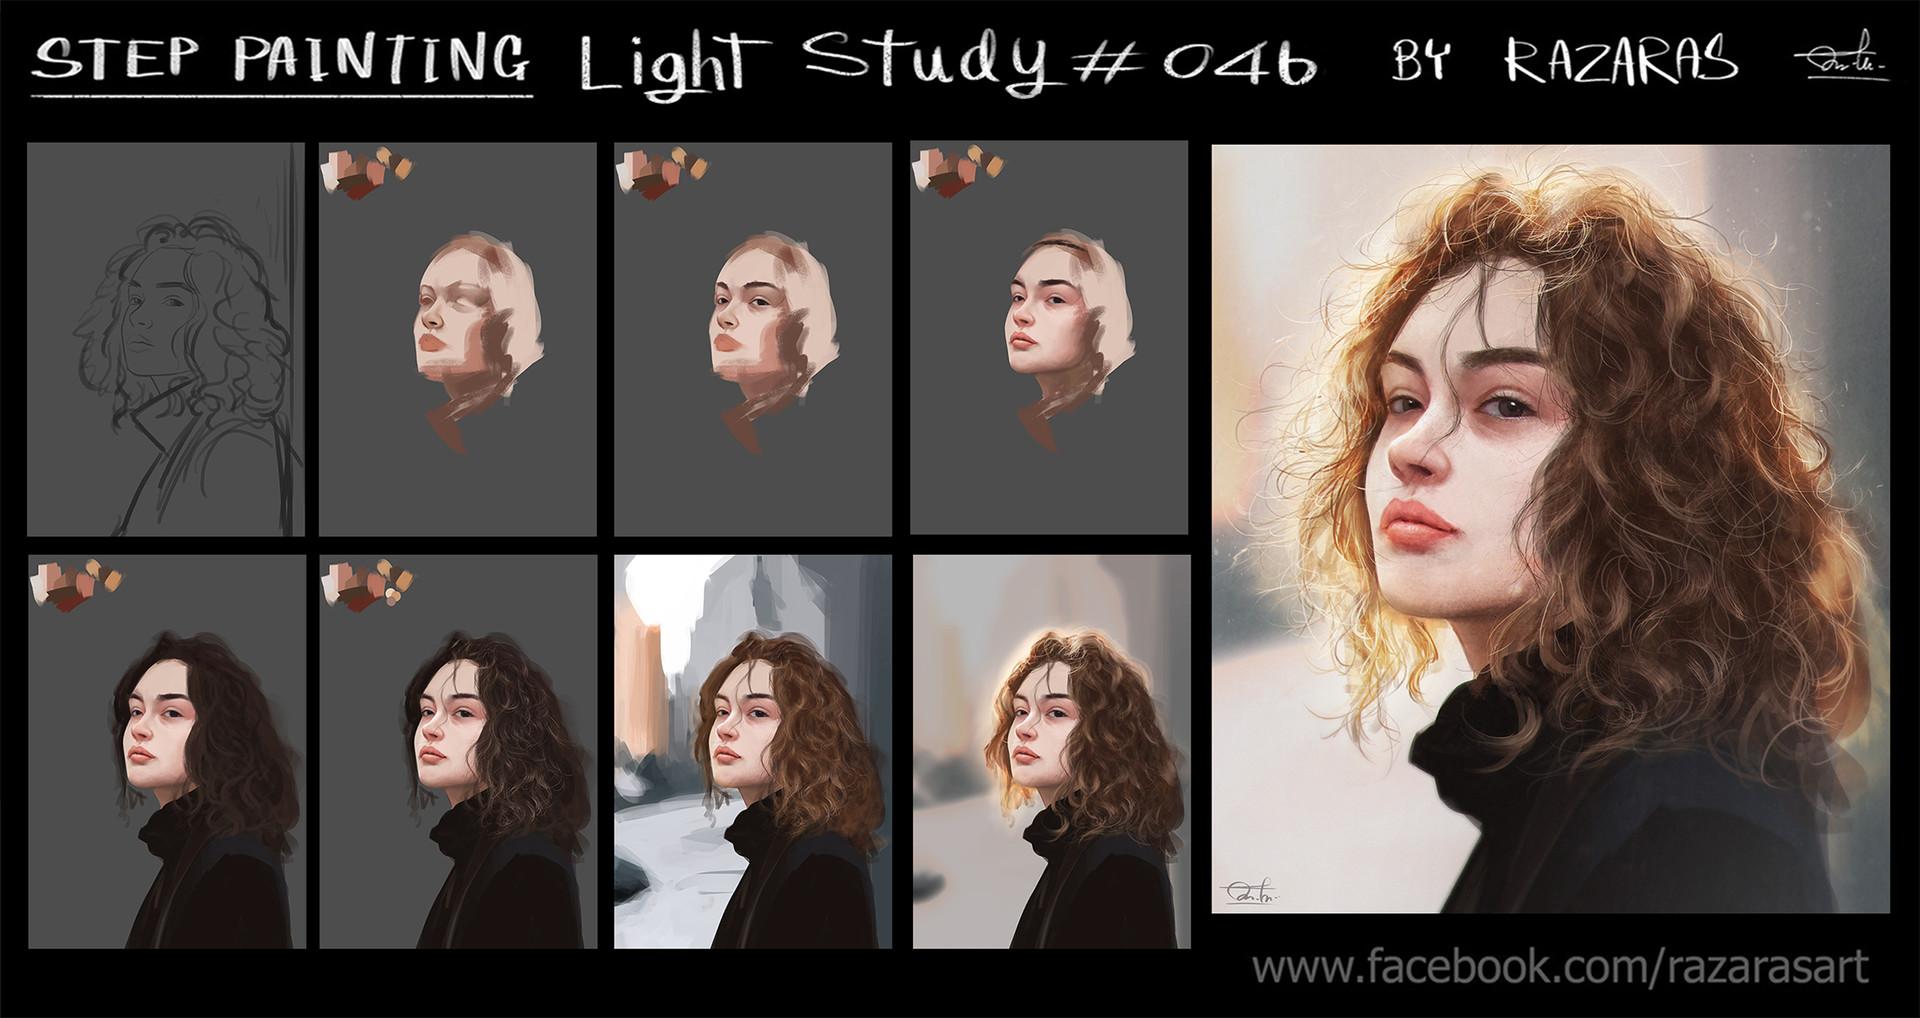 Kittichai reaungchaichan how to light 45